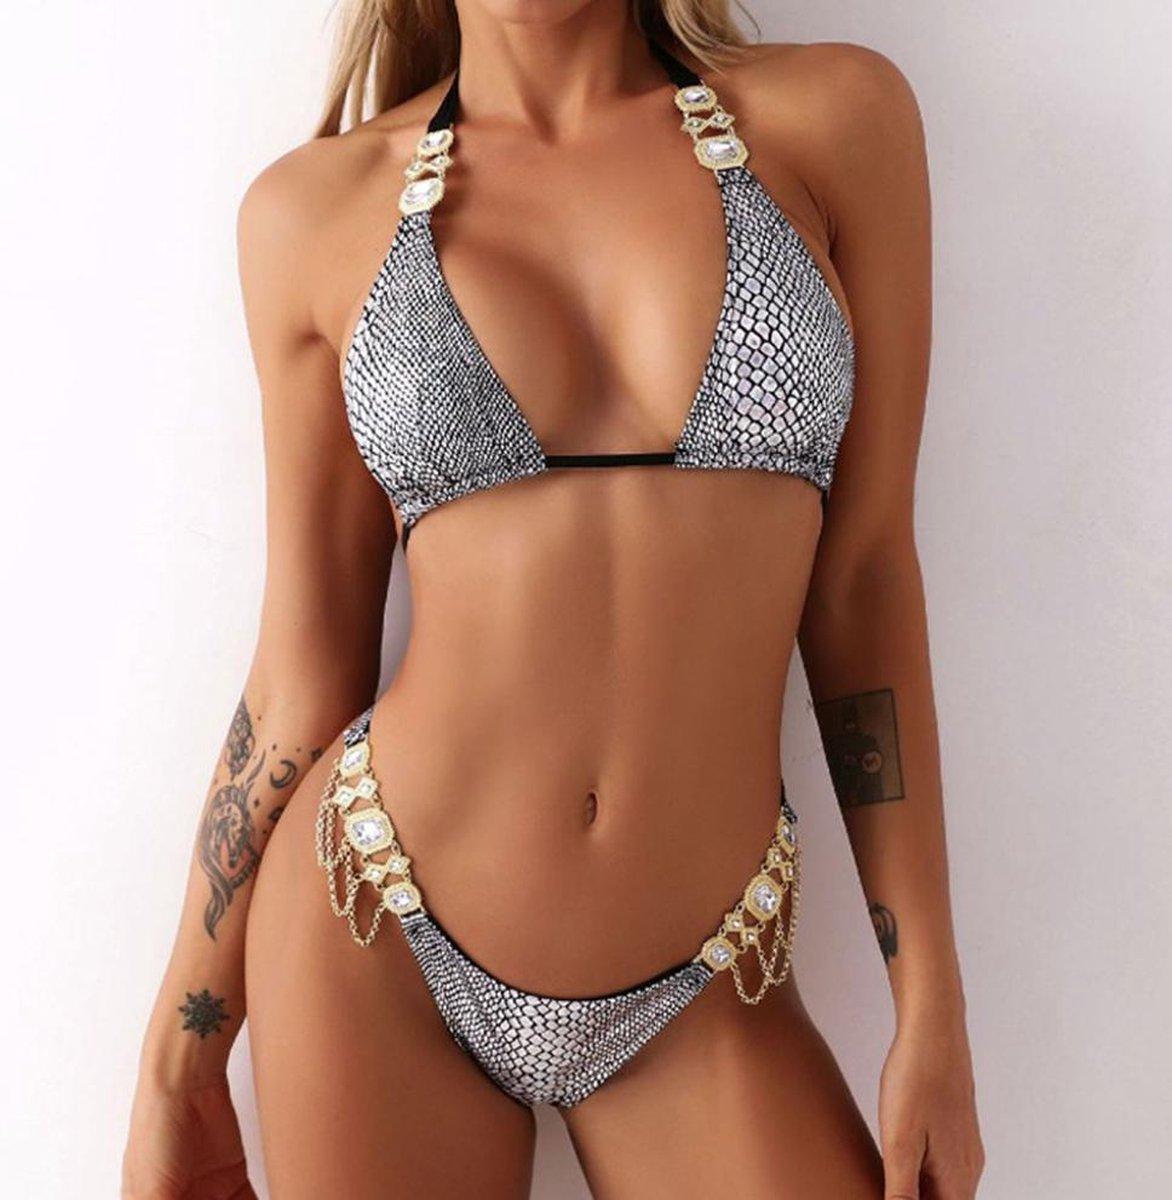 Trendy Bikini - Juwelen bikini's - Bikini - Strandmode - Hippe bikini - Slangen print